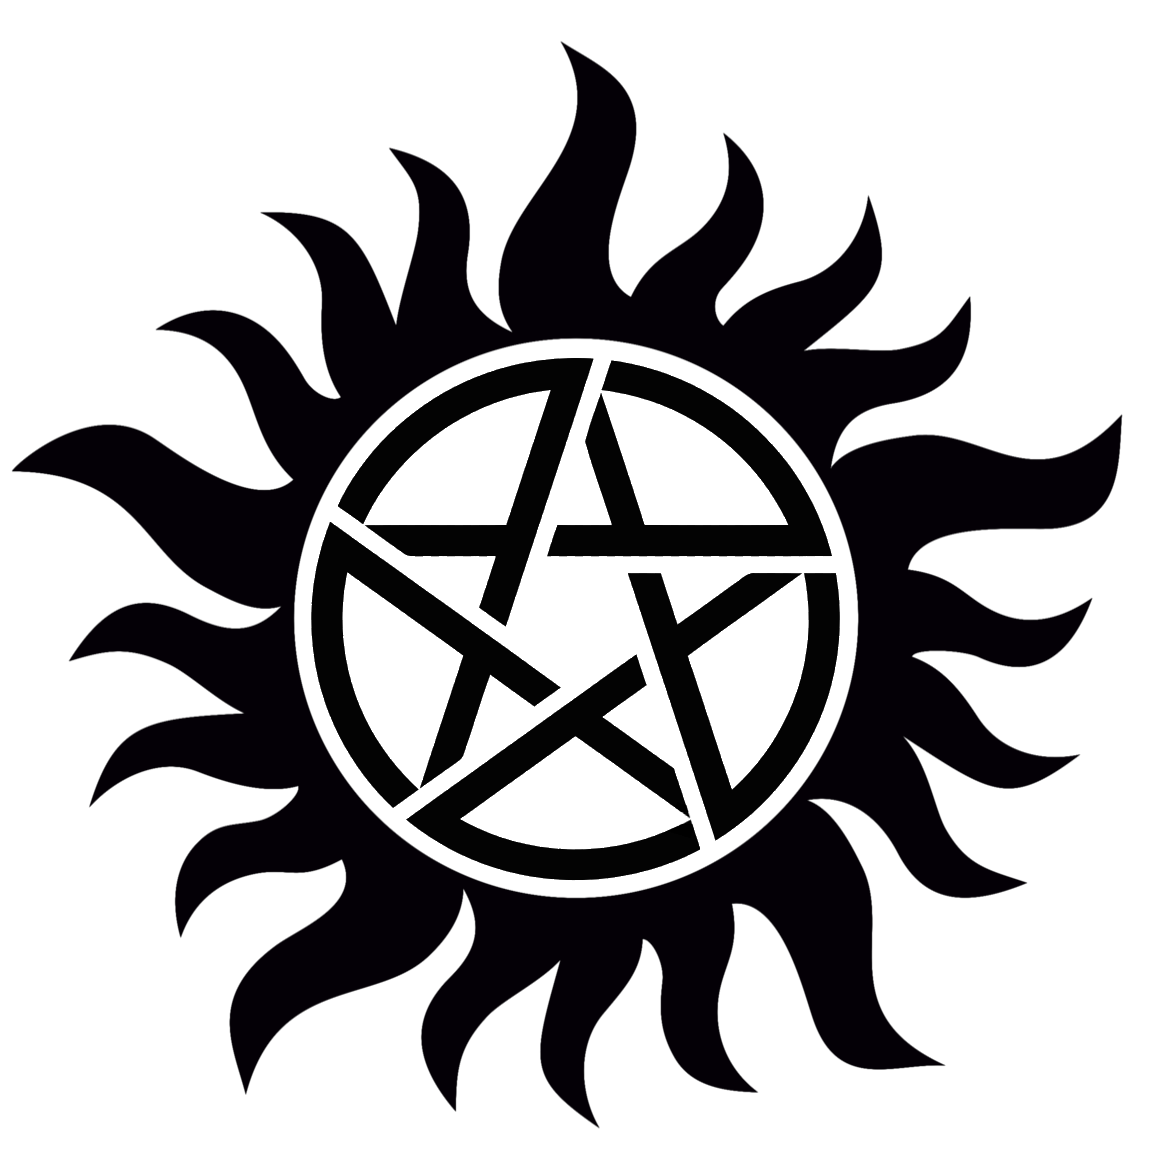 supernatural anti possession symbol [ 1150 x 1150 Pixel ]